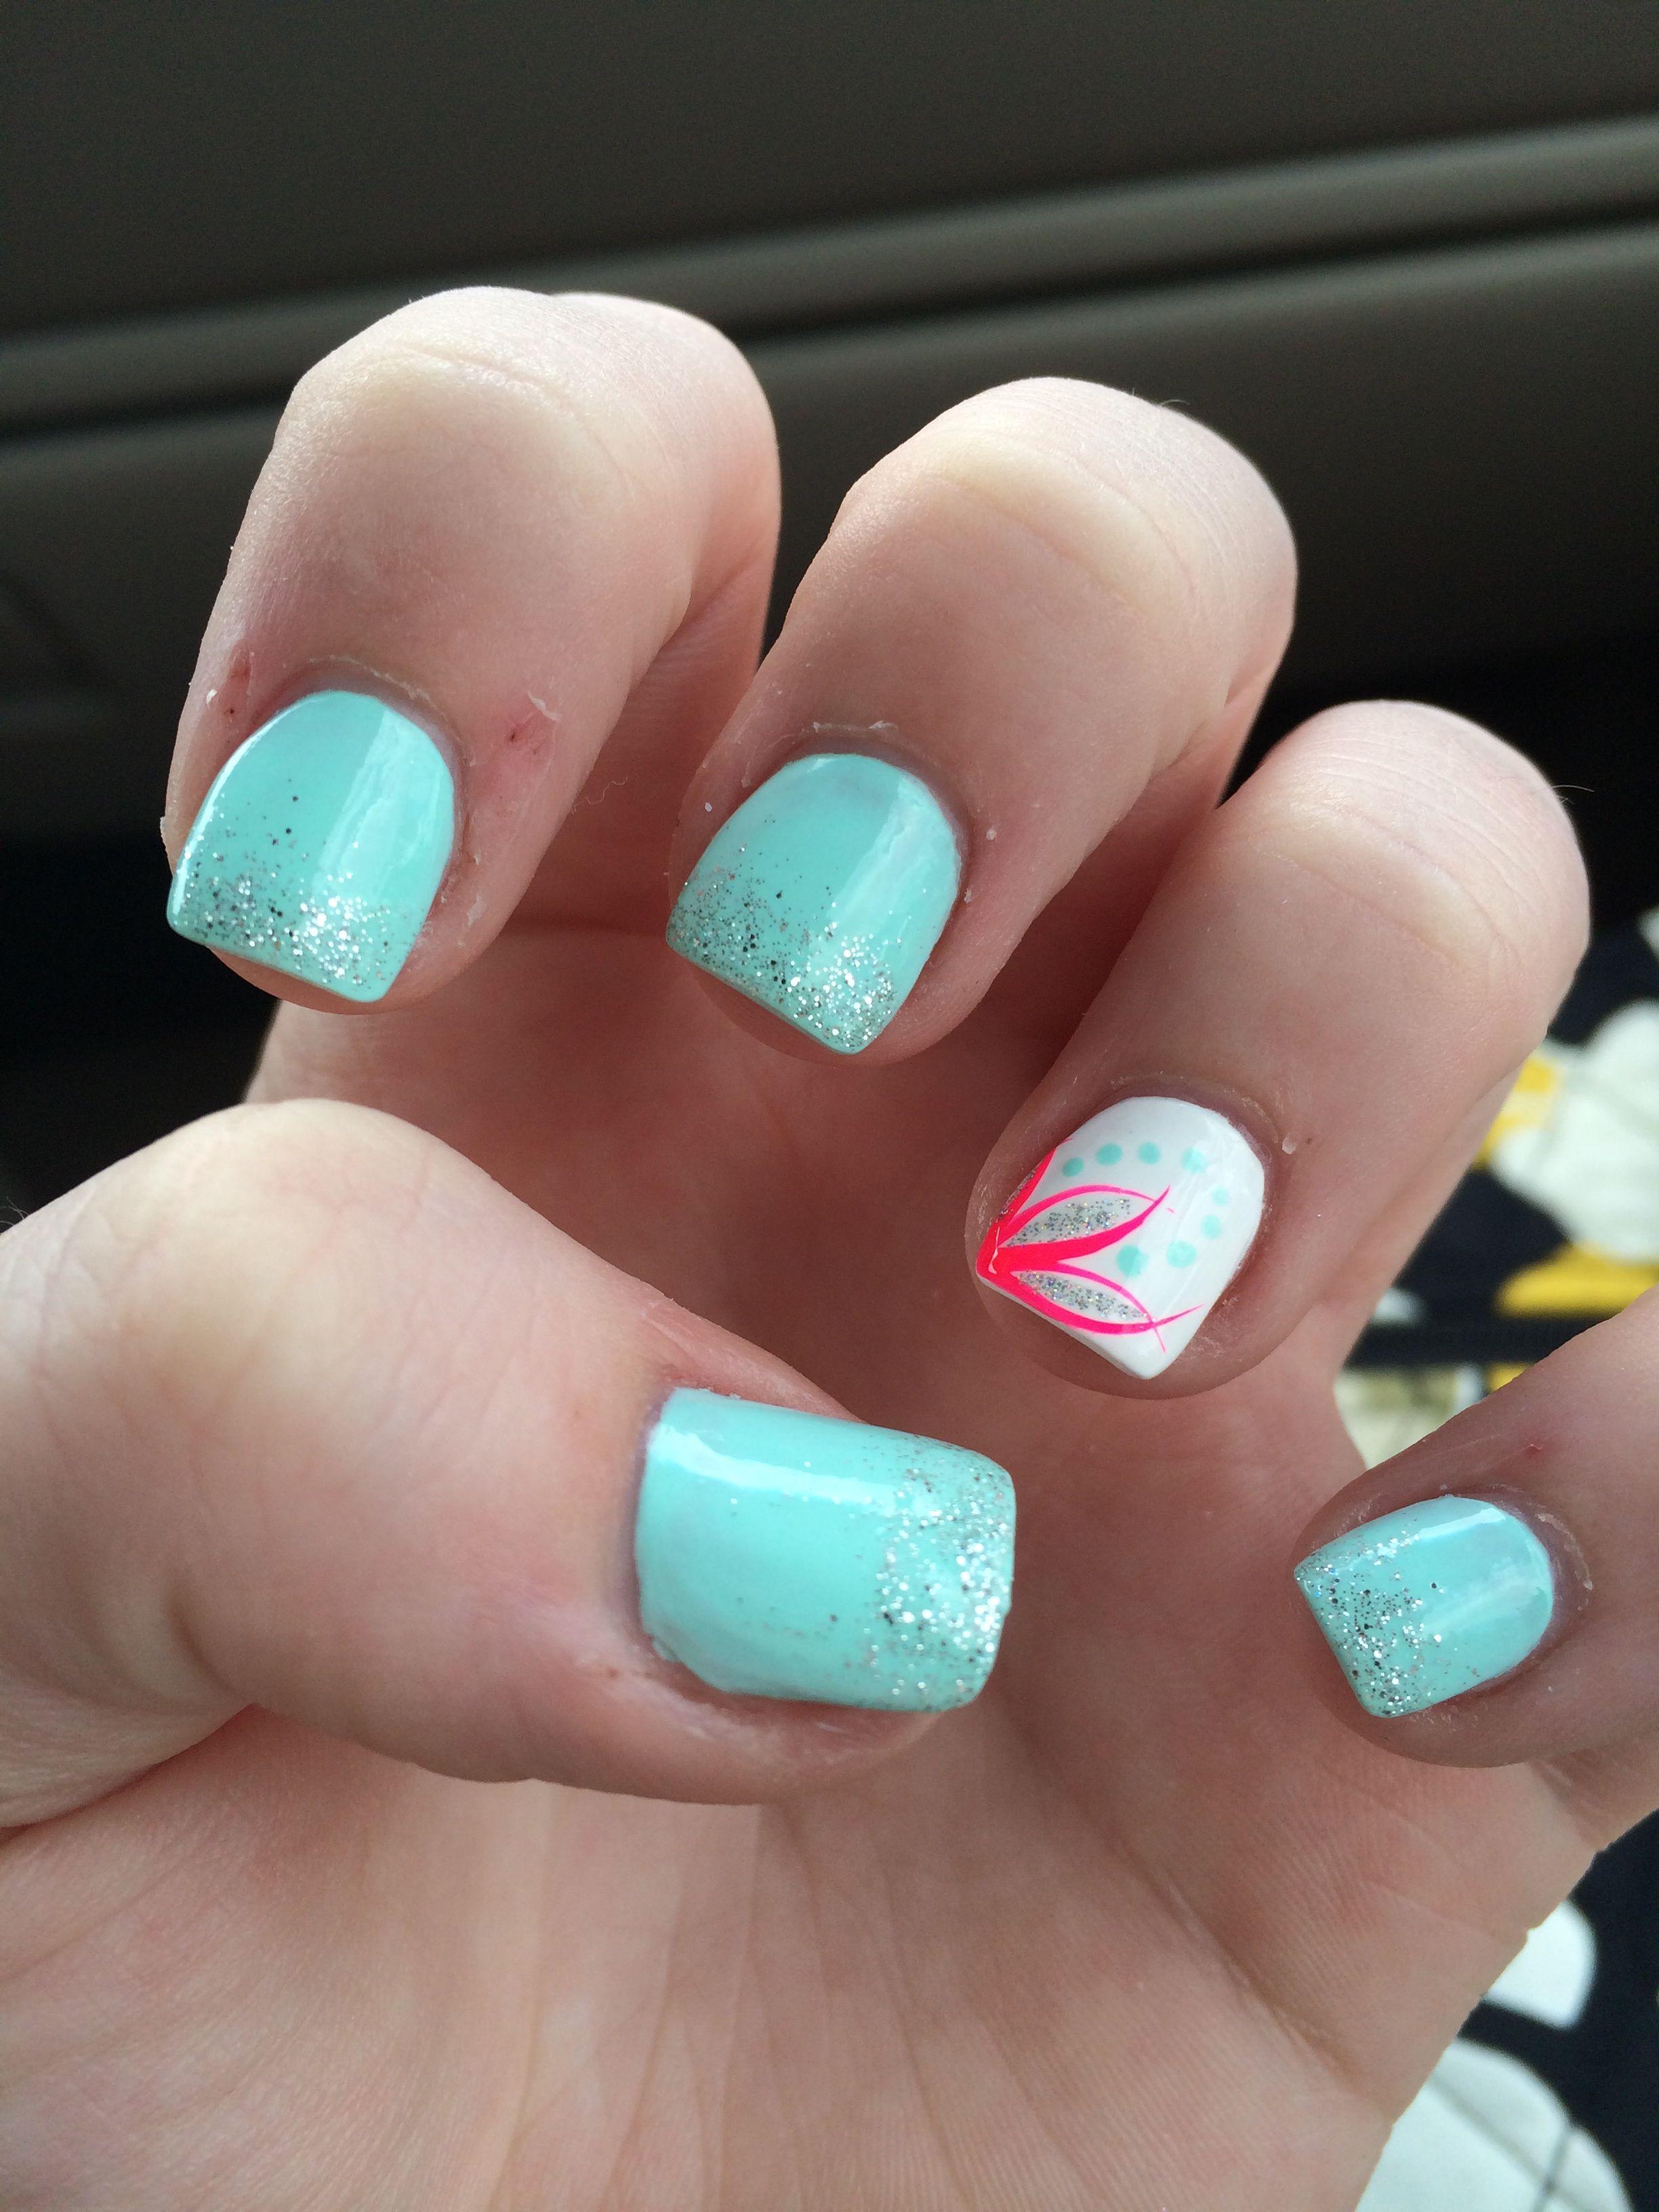 Acryl für nägel besten page of summer acrylic nails